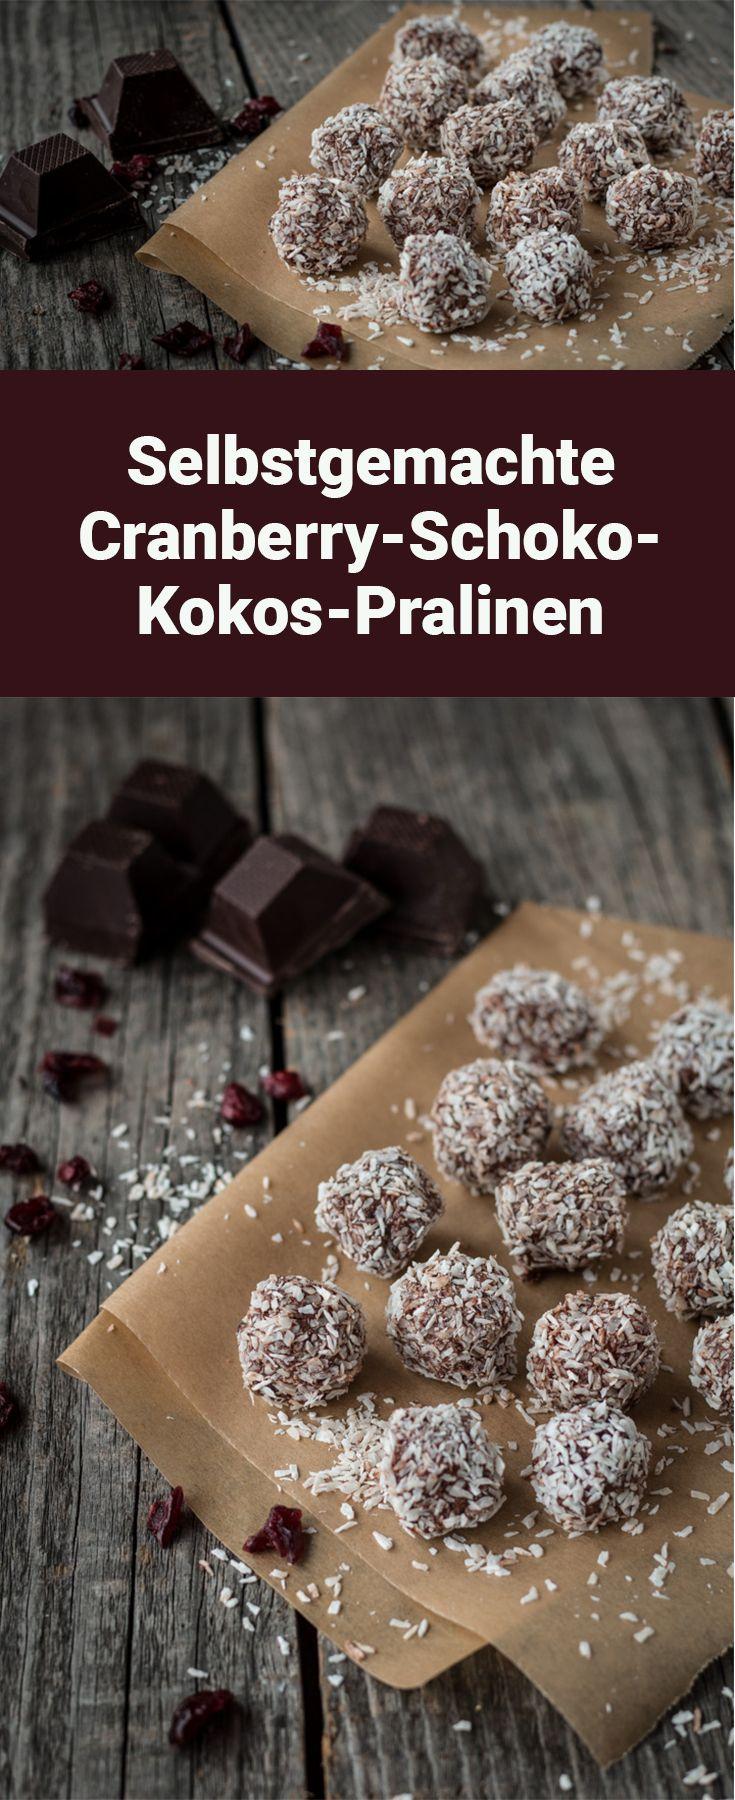 Selbstgemachte Cranberry-Schoko-Kokos-Pralinen (vegan)